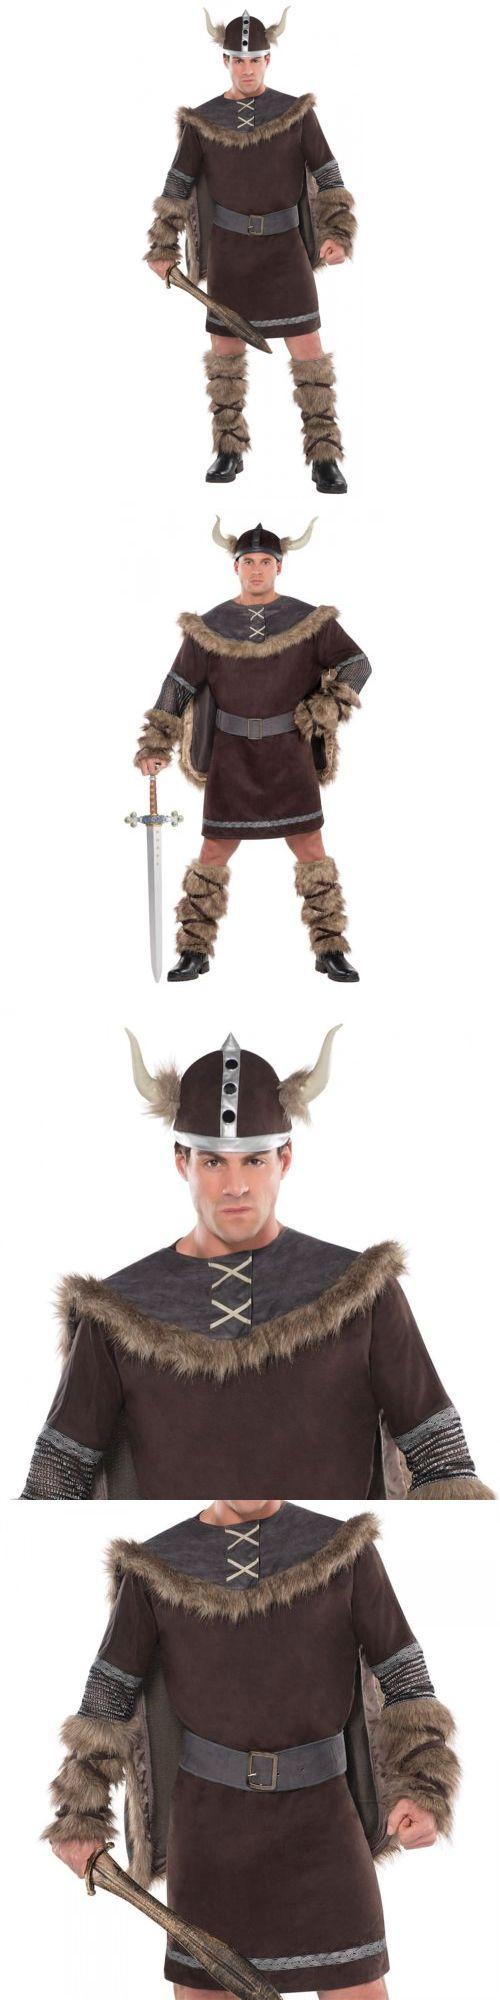 236 best Halloween Costumes Men images on Pinterest